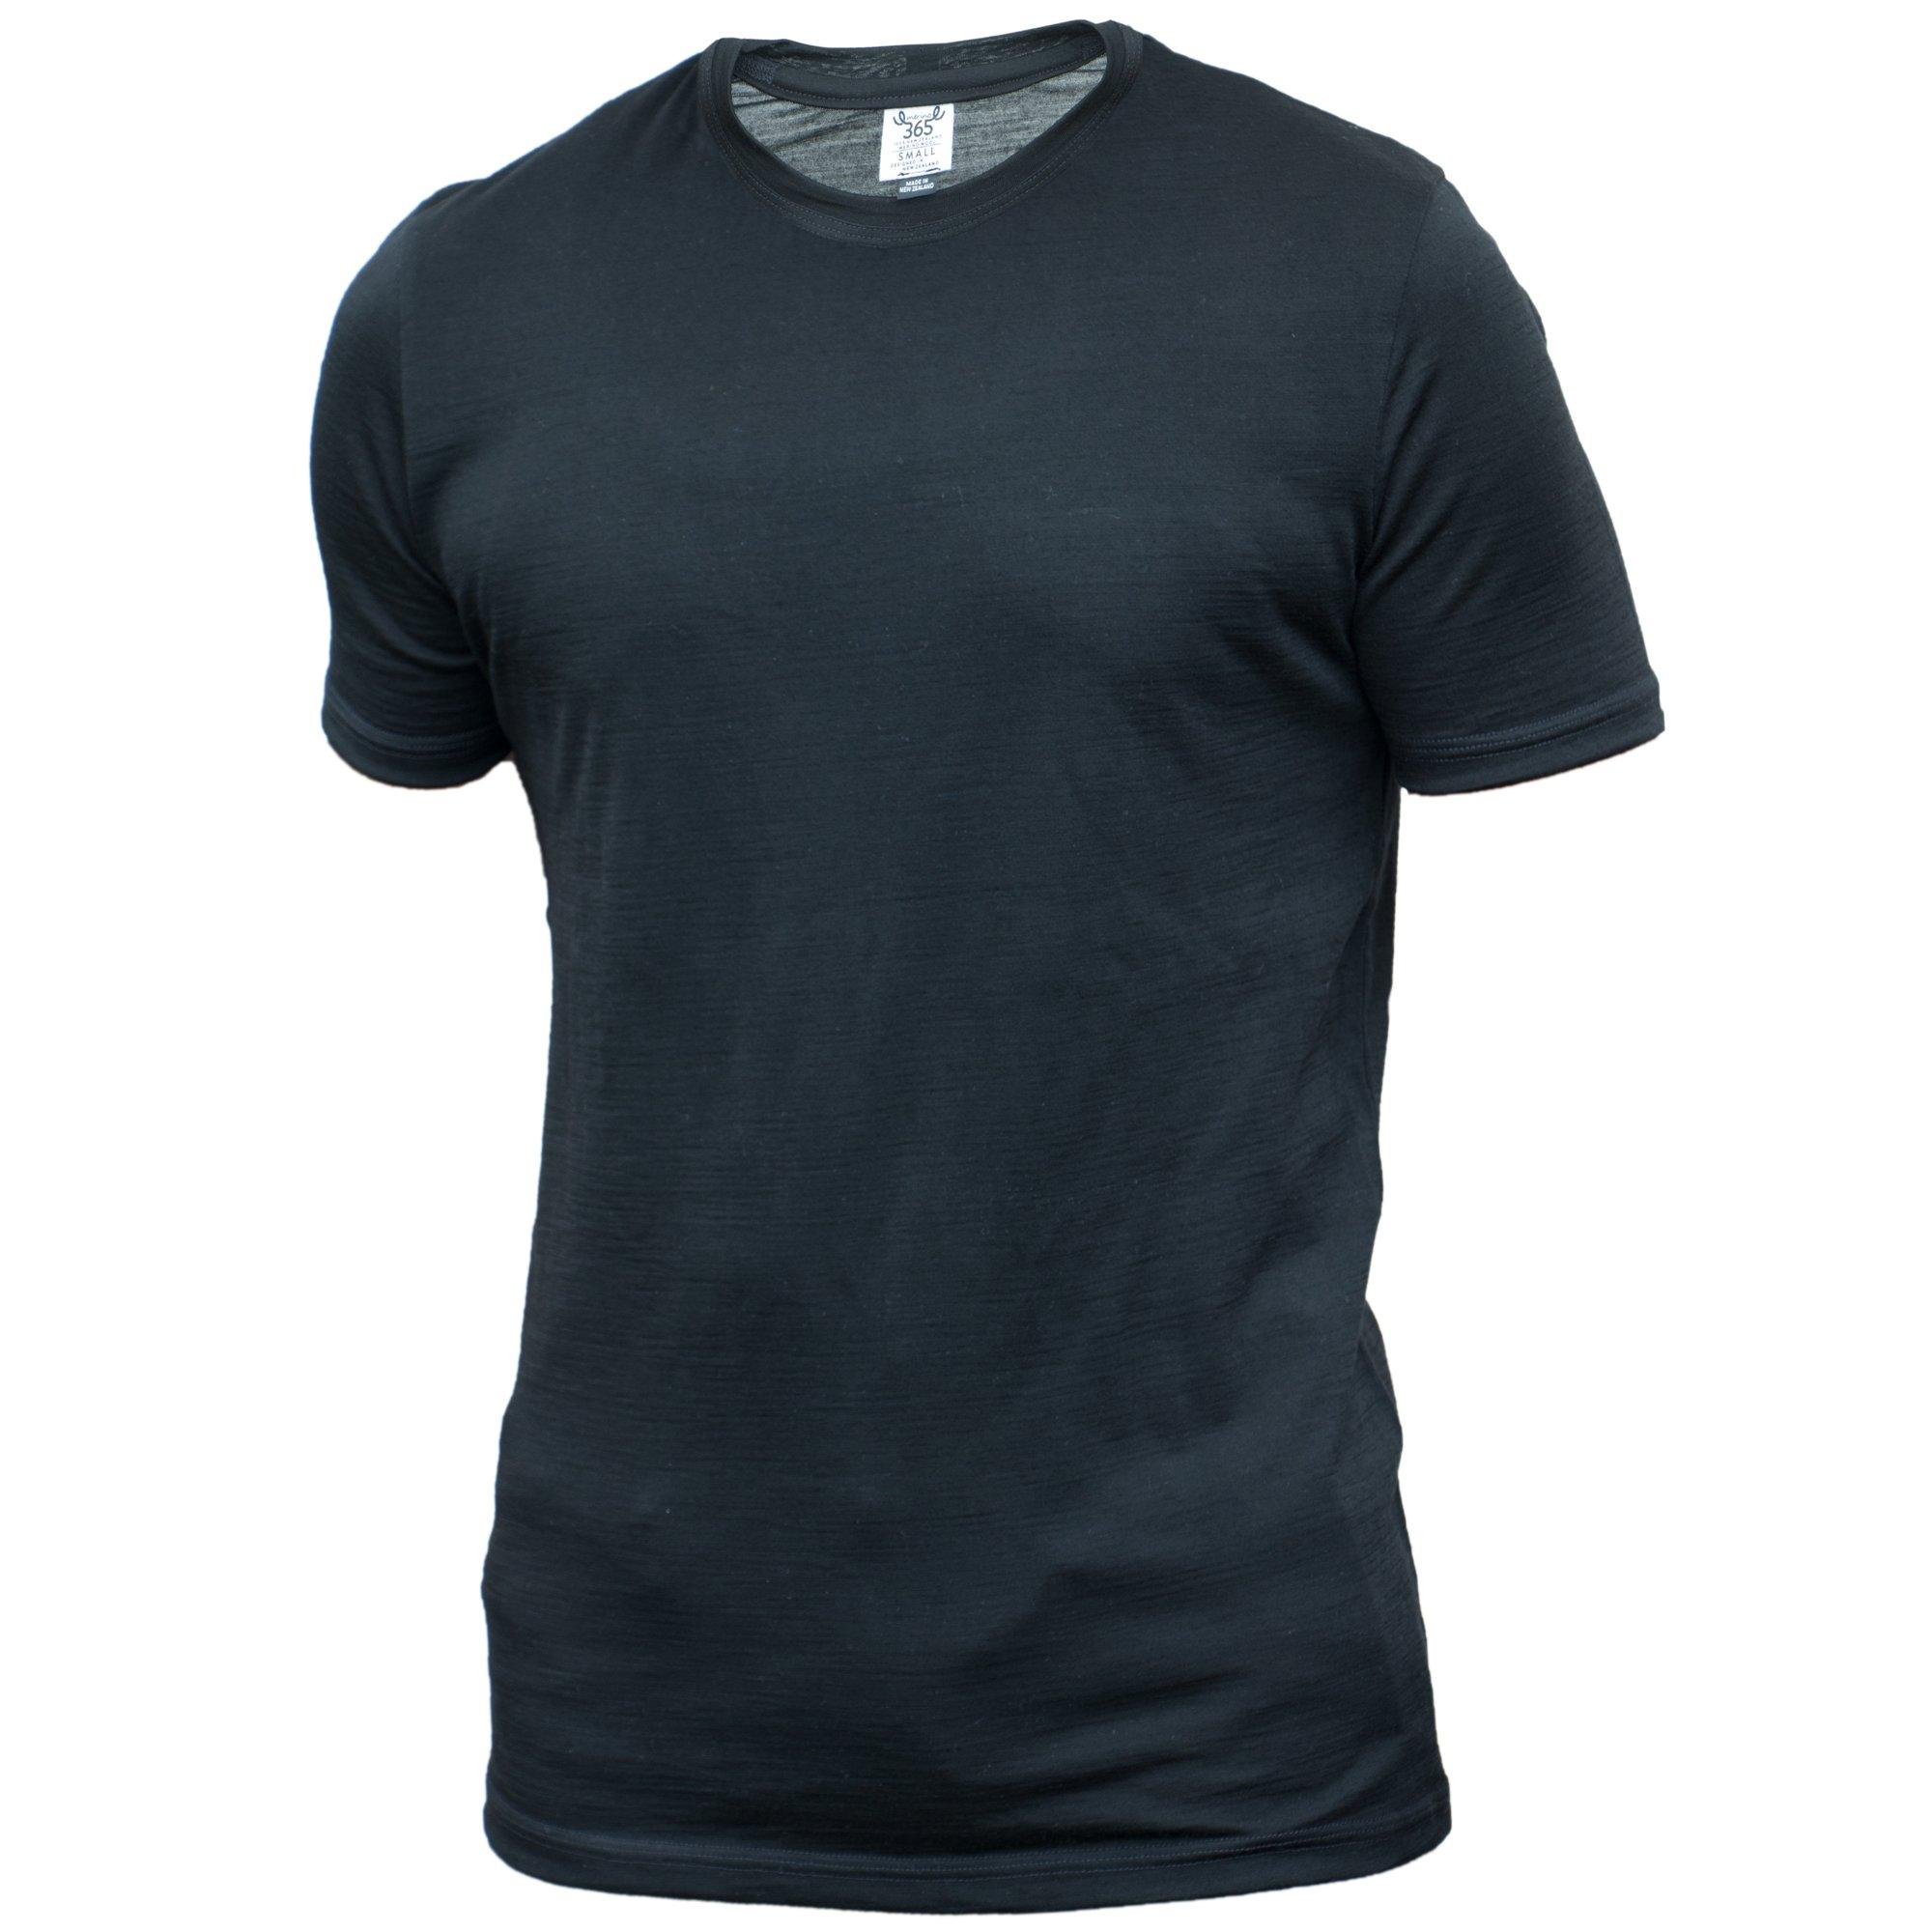 Merino 365 Men's Crew Short Sleeve Large, Black by Merino 365